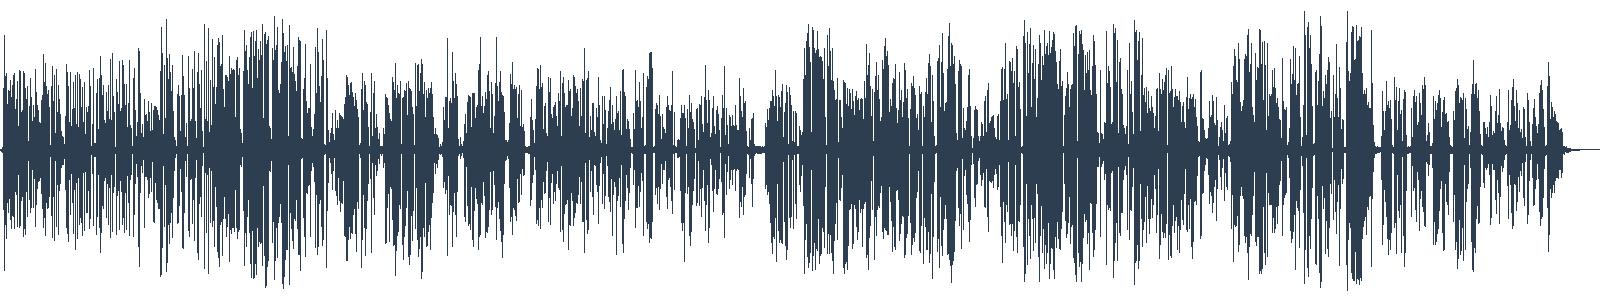 Apríl u Spejblů waveform